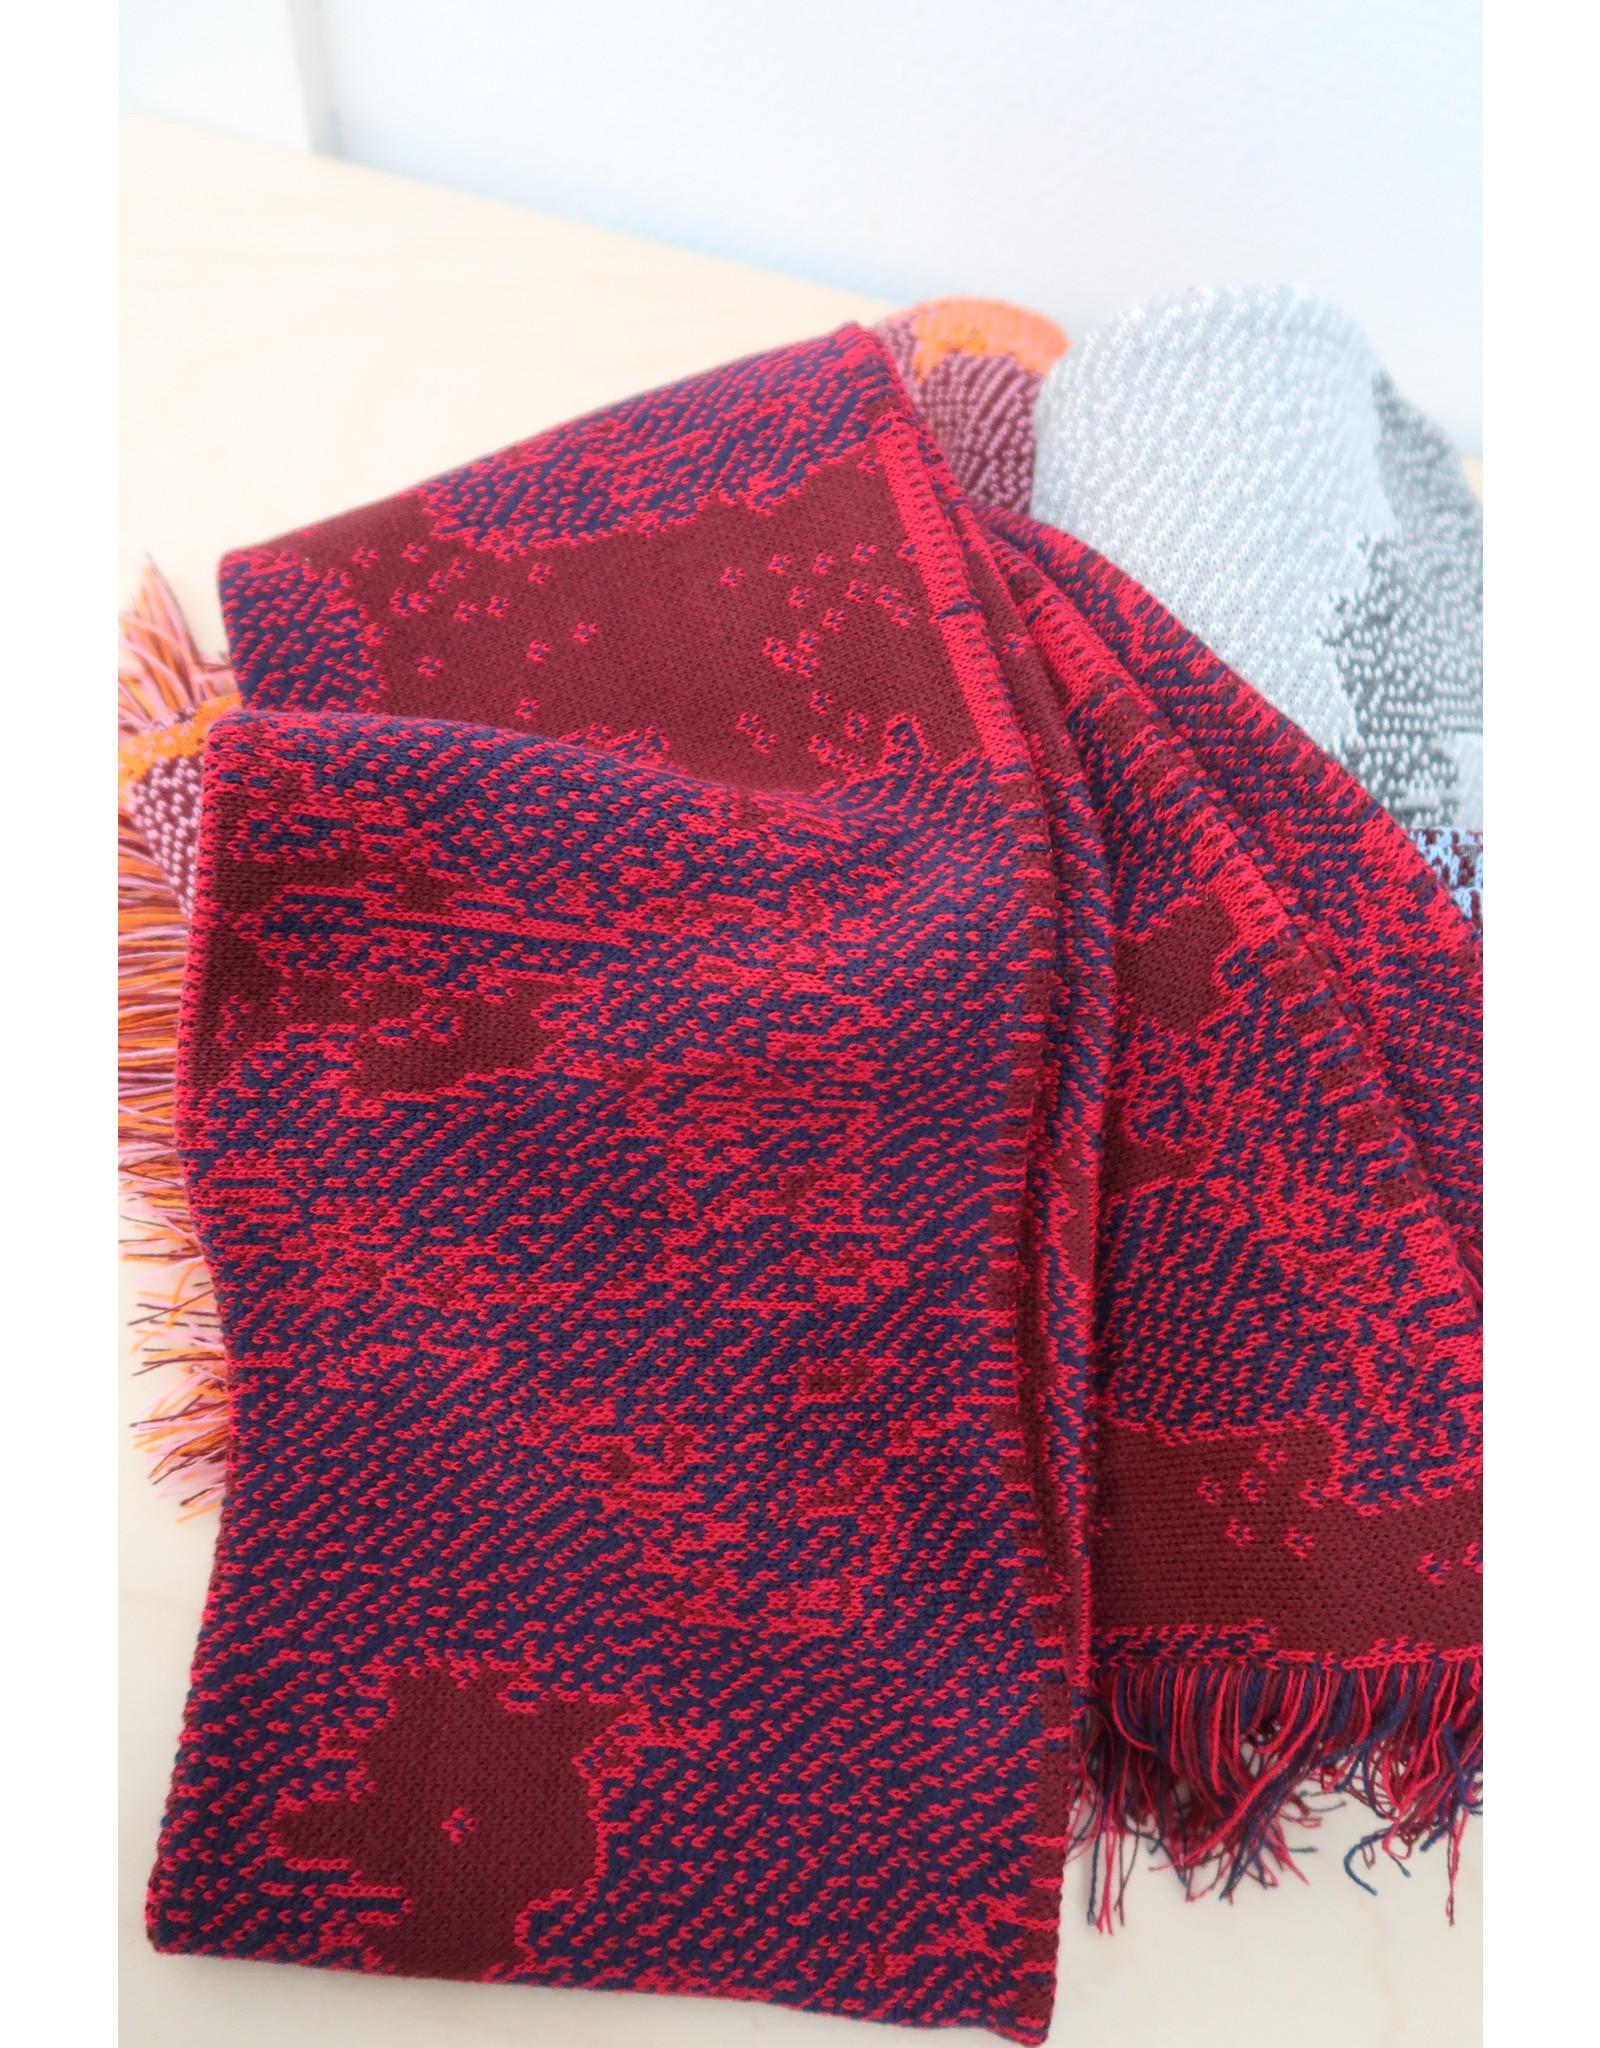 Violet Nys Sjaal - Rood, Donkerblauw, Kastanje - Acryl - 17 x 145 cm